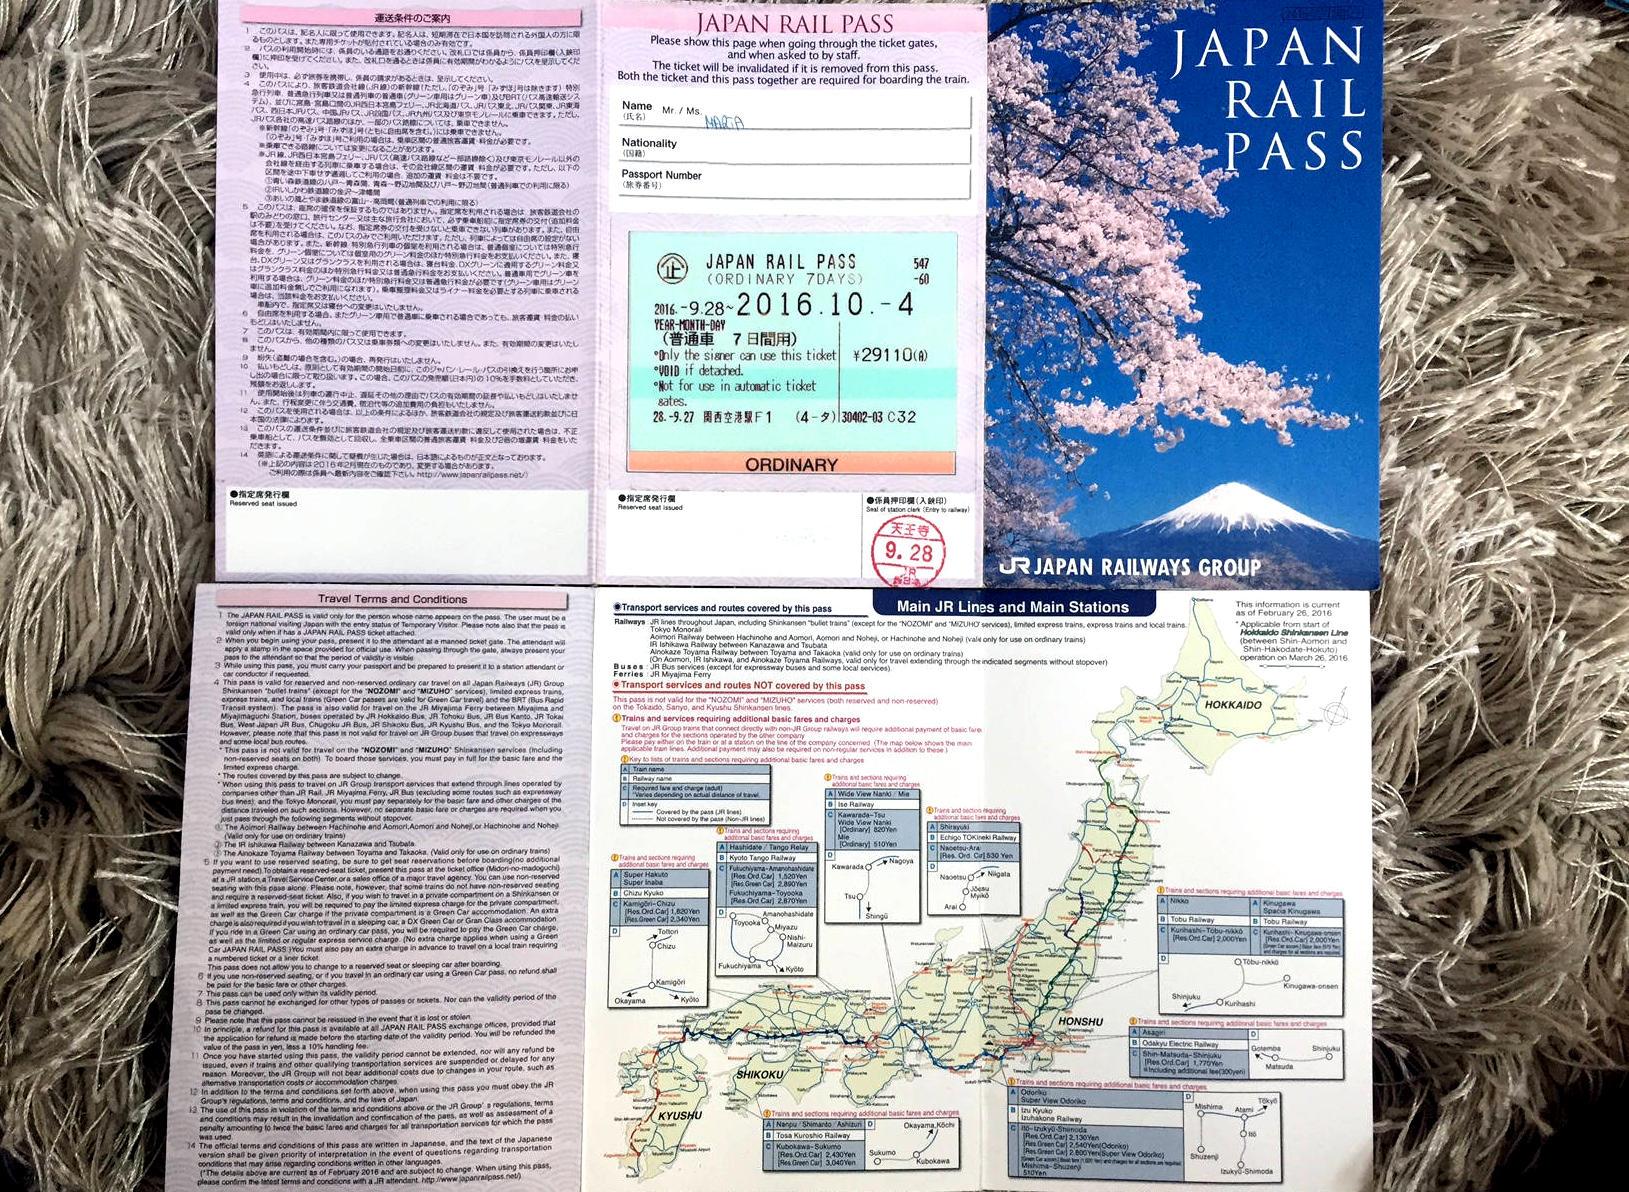 japonia pociag bilet railpass iglawpodrozy